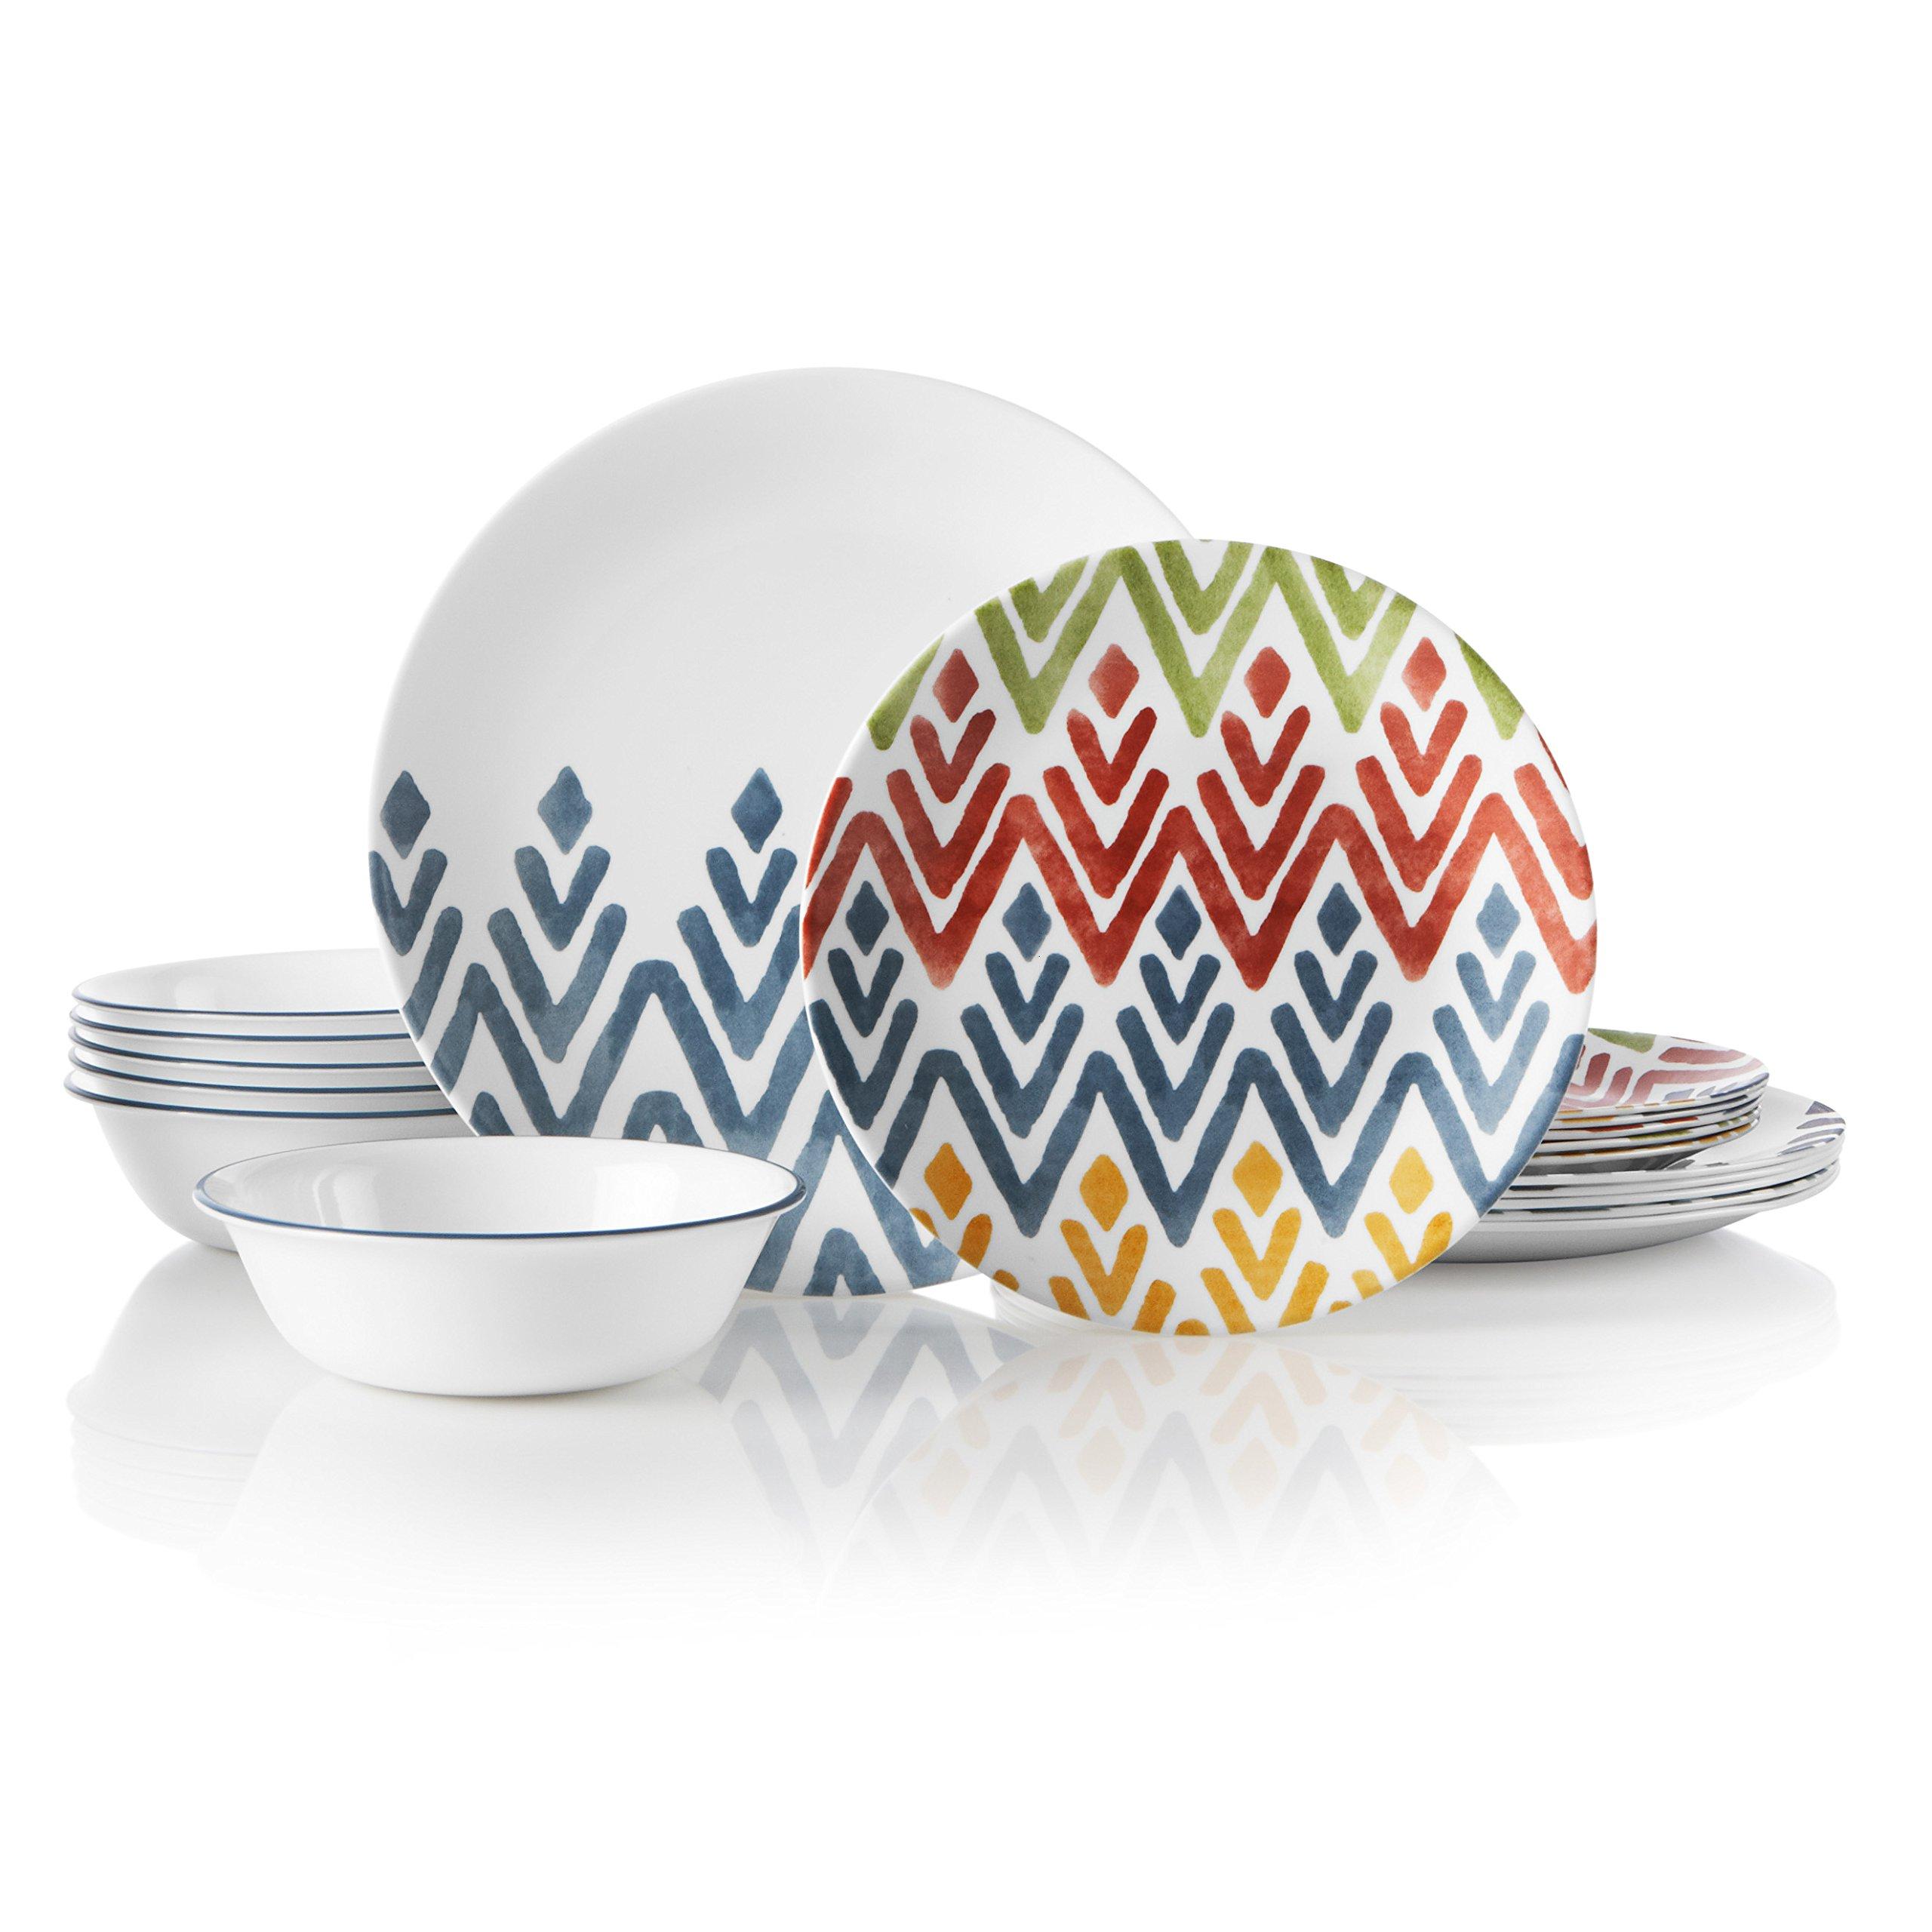 Corelle 18-Piece Service for 6, Chip Resistant, Zamba Dinnerware Set,